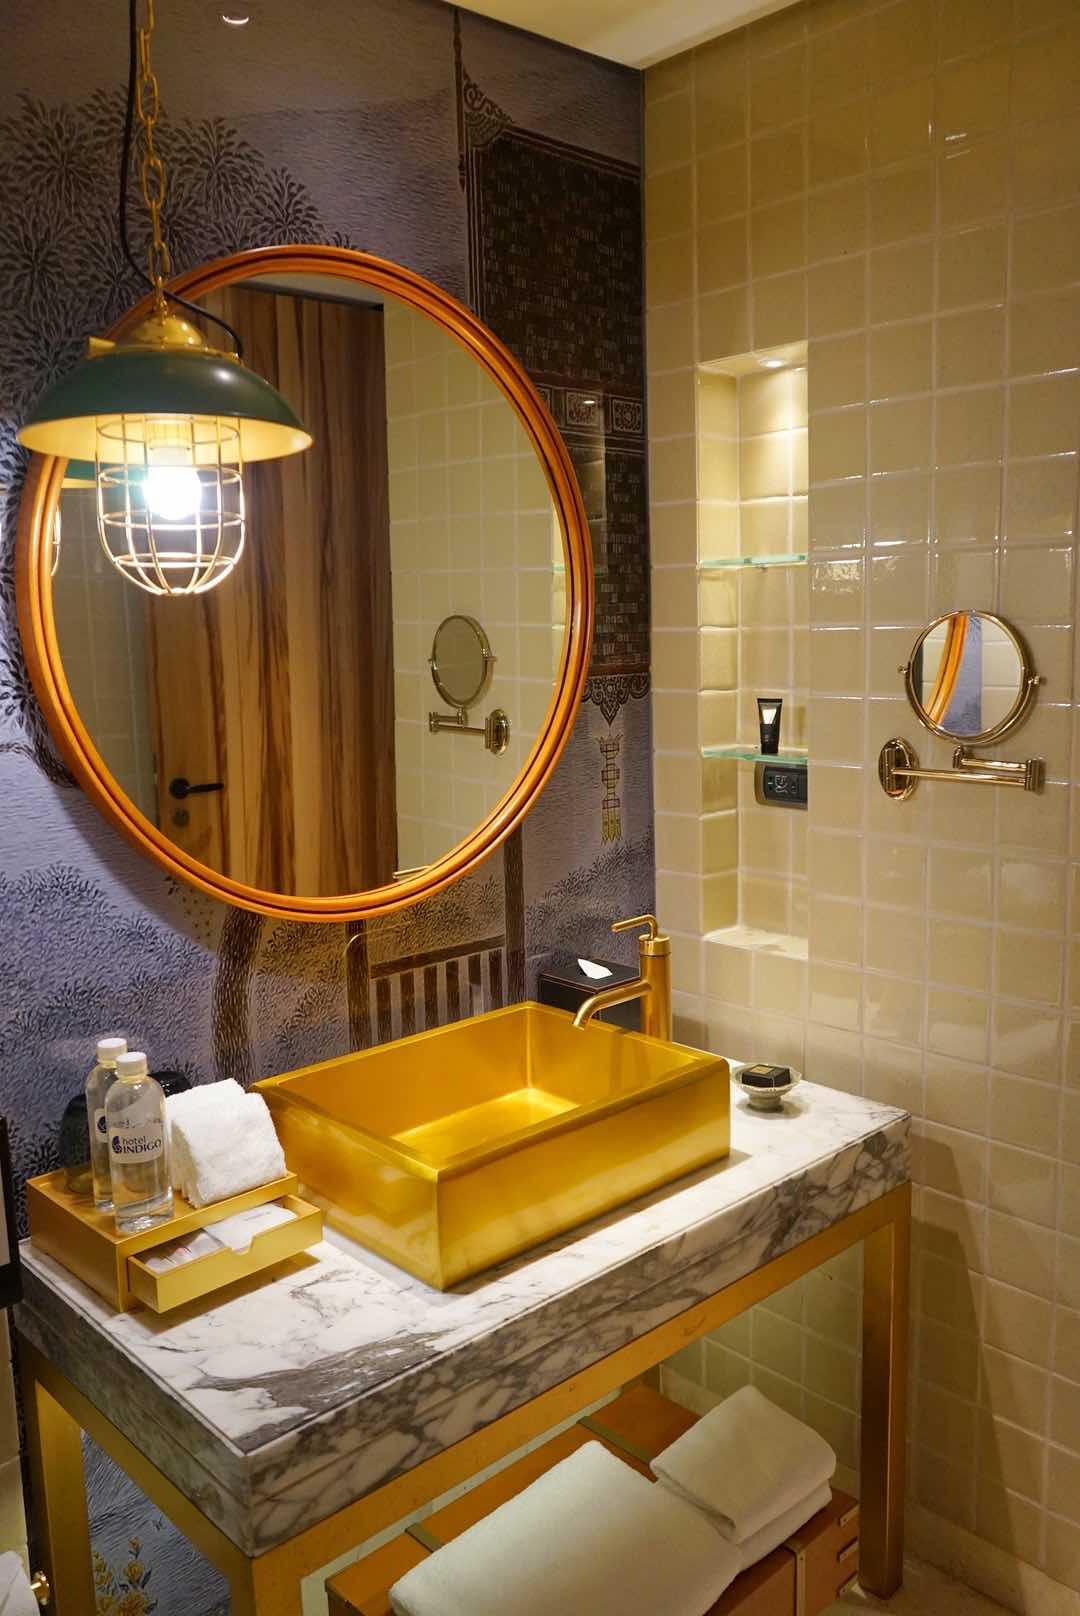 Golden Tap & Basin Hotel Indigo Bangkok - AspirantSG